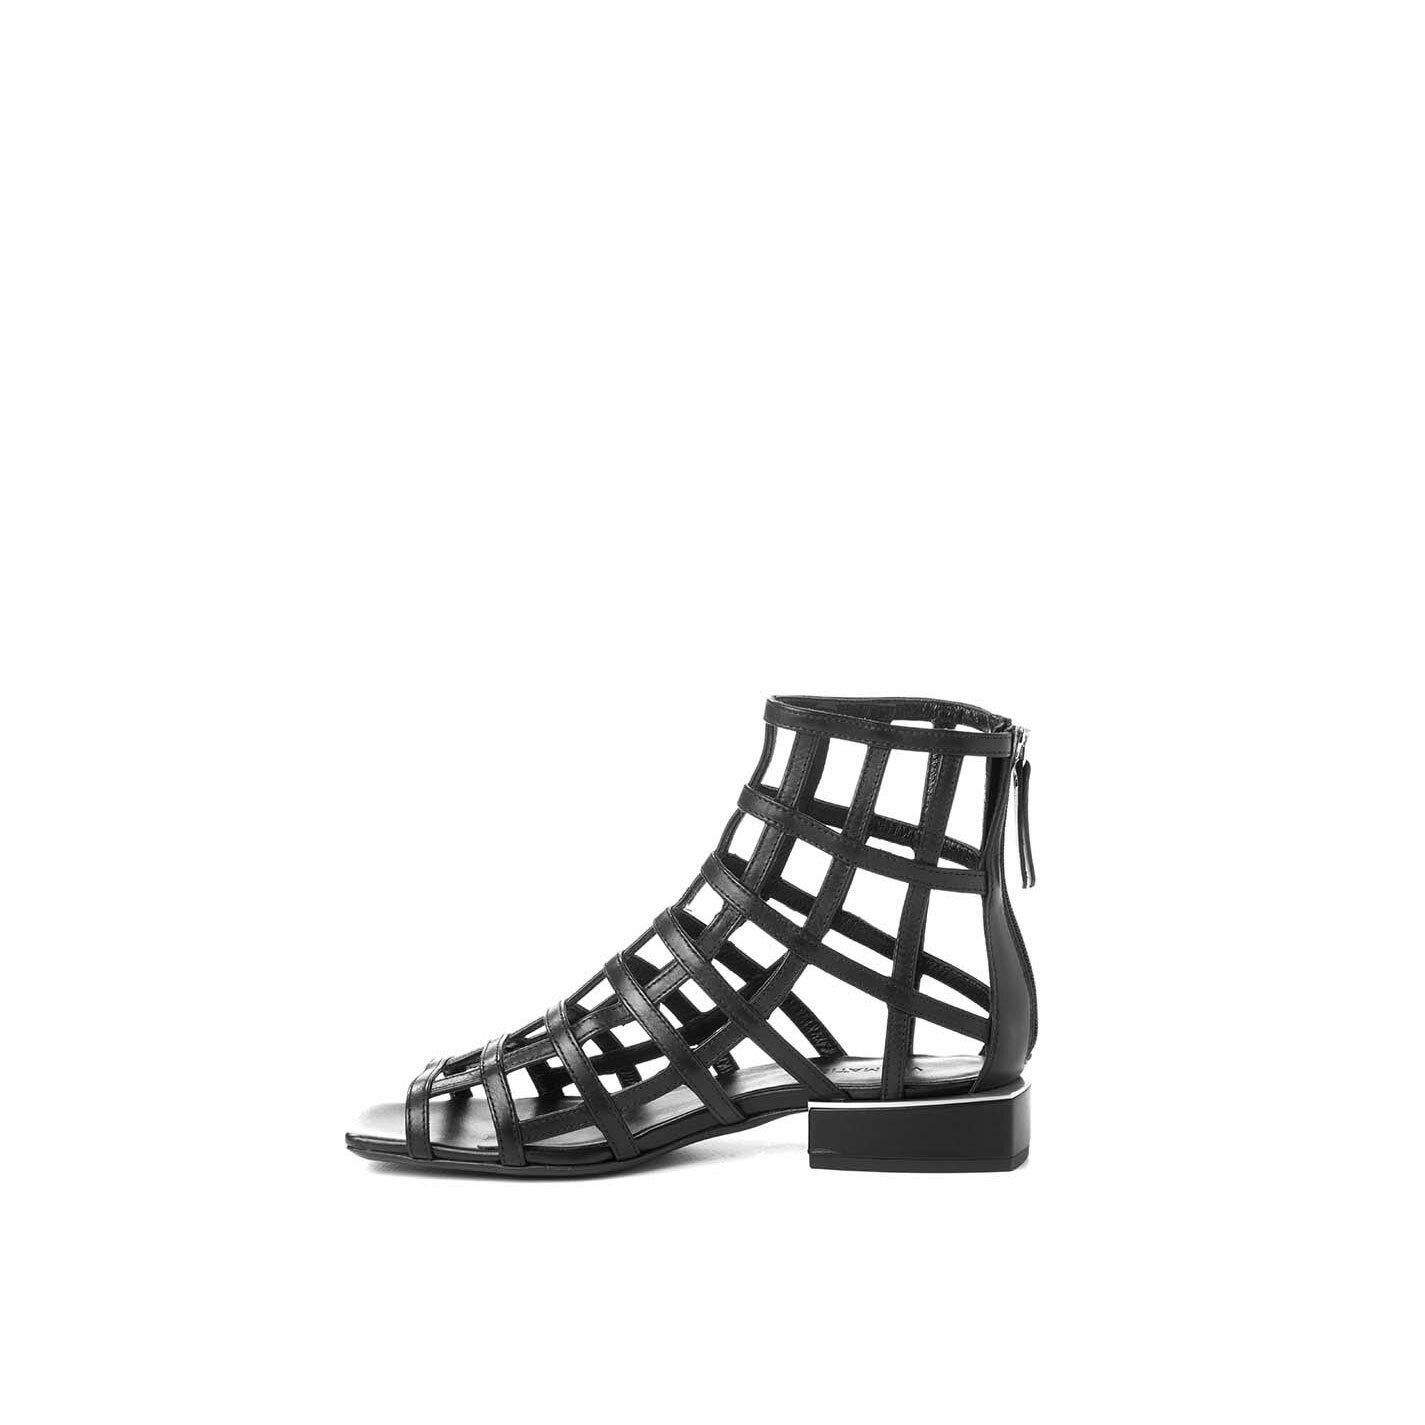 Flat high-top cage sandals in black calfskin